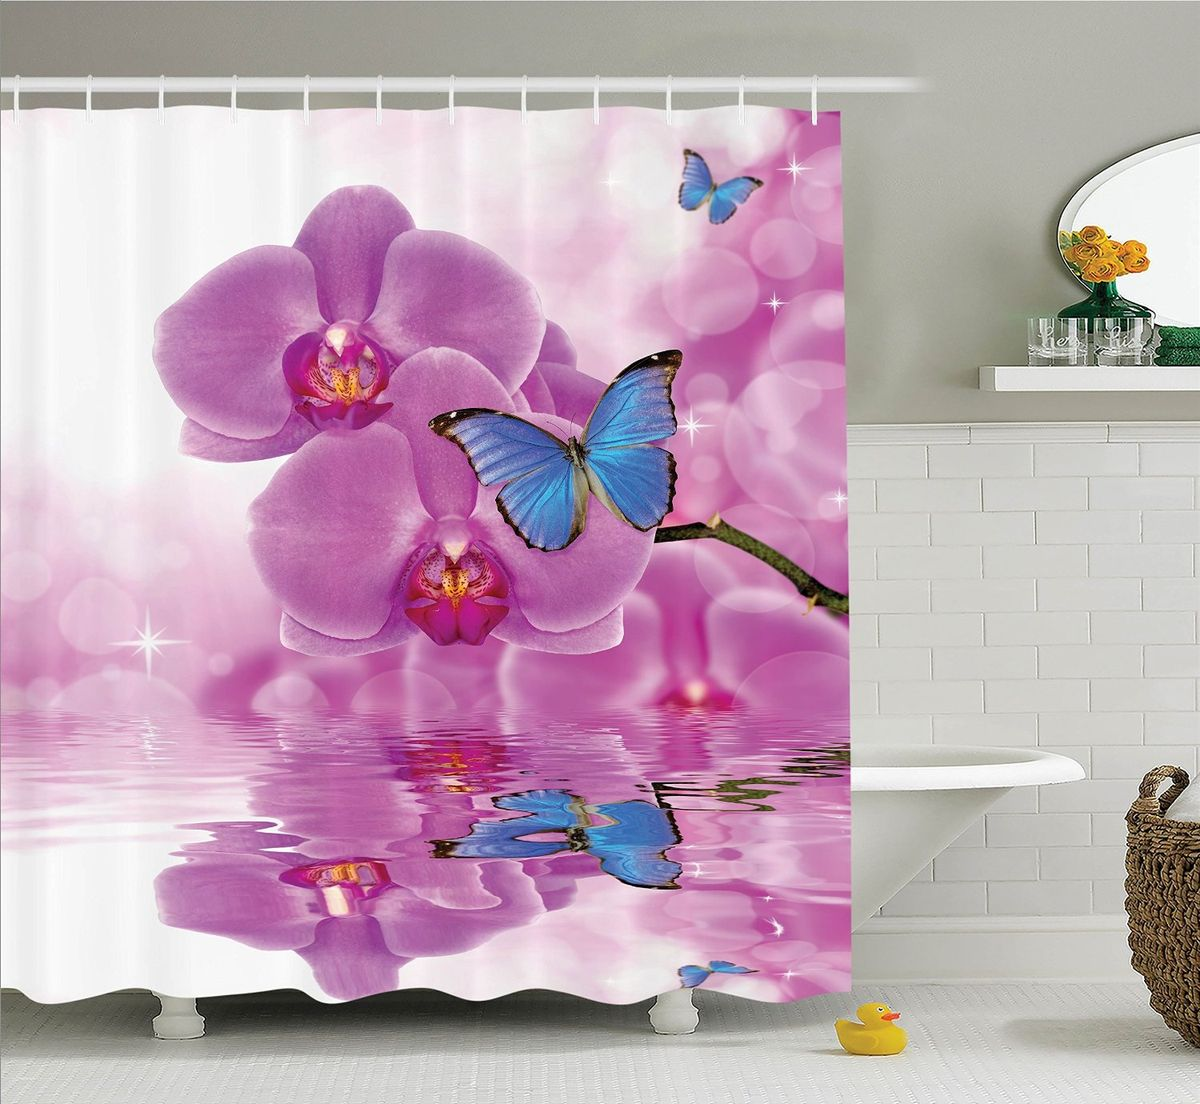 Штора для ванной комнаты Magic Lady Бабочки на цветах орхидеи, 180 х 200 см